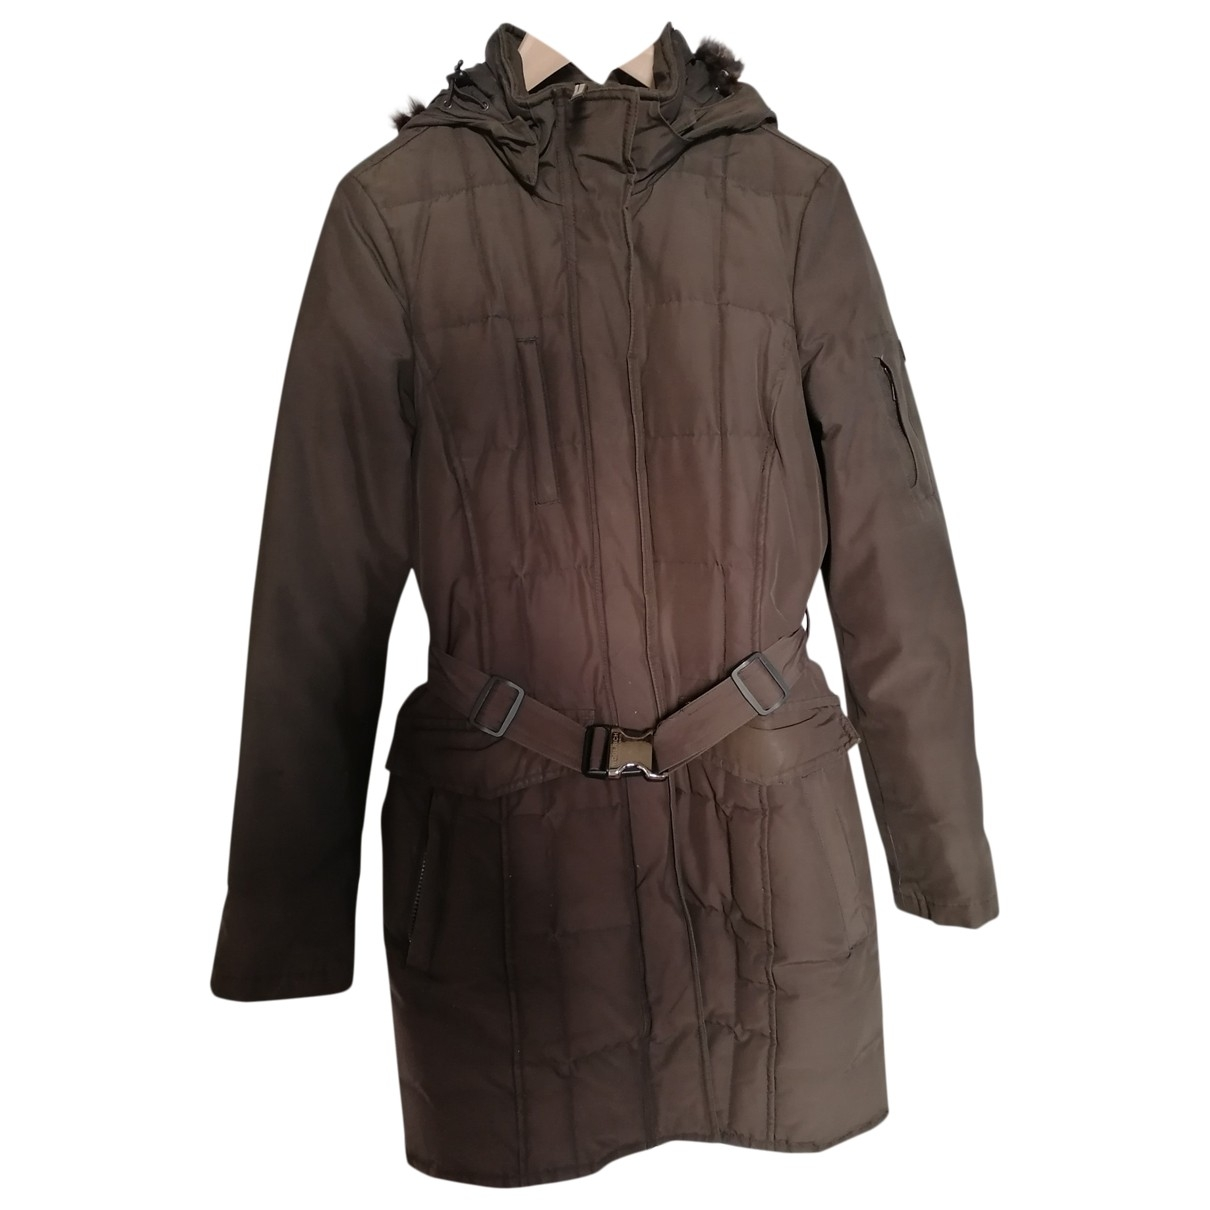 Woolrich \N Brown coat for Women S International